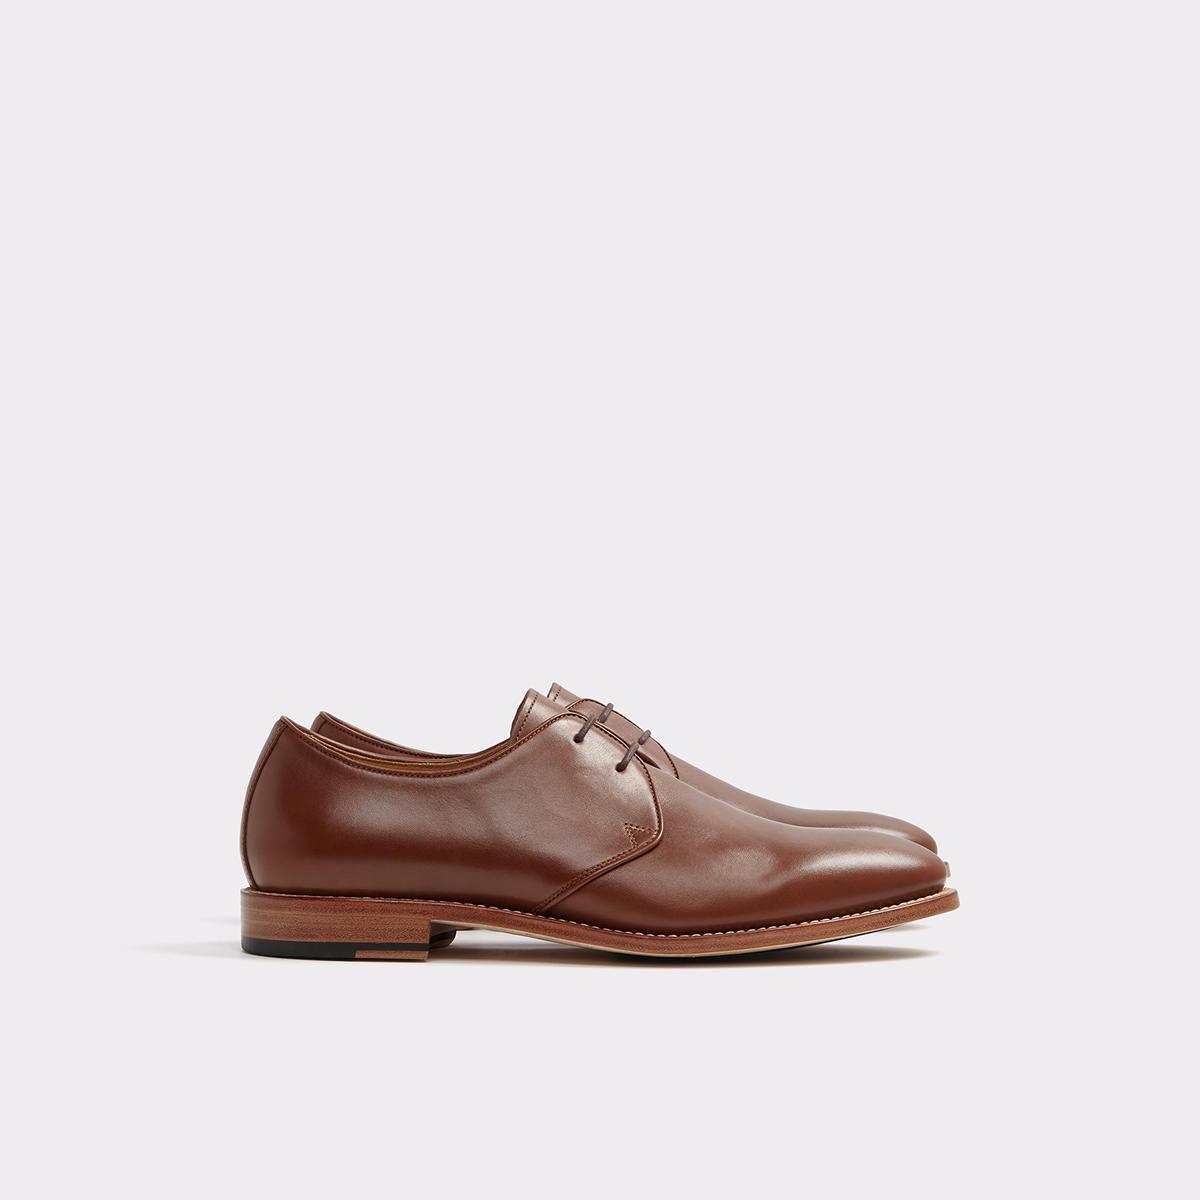 Scalchi Light Brown Men's Dress shoes | ALDO US at Aldo Shoes in Victor, NY | Tuggl